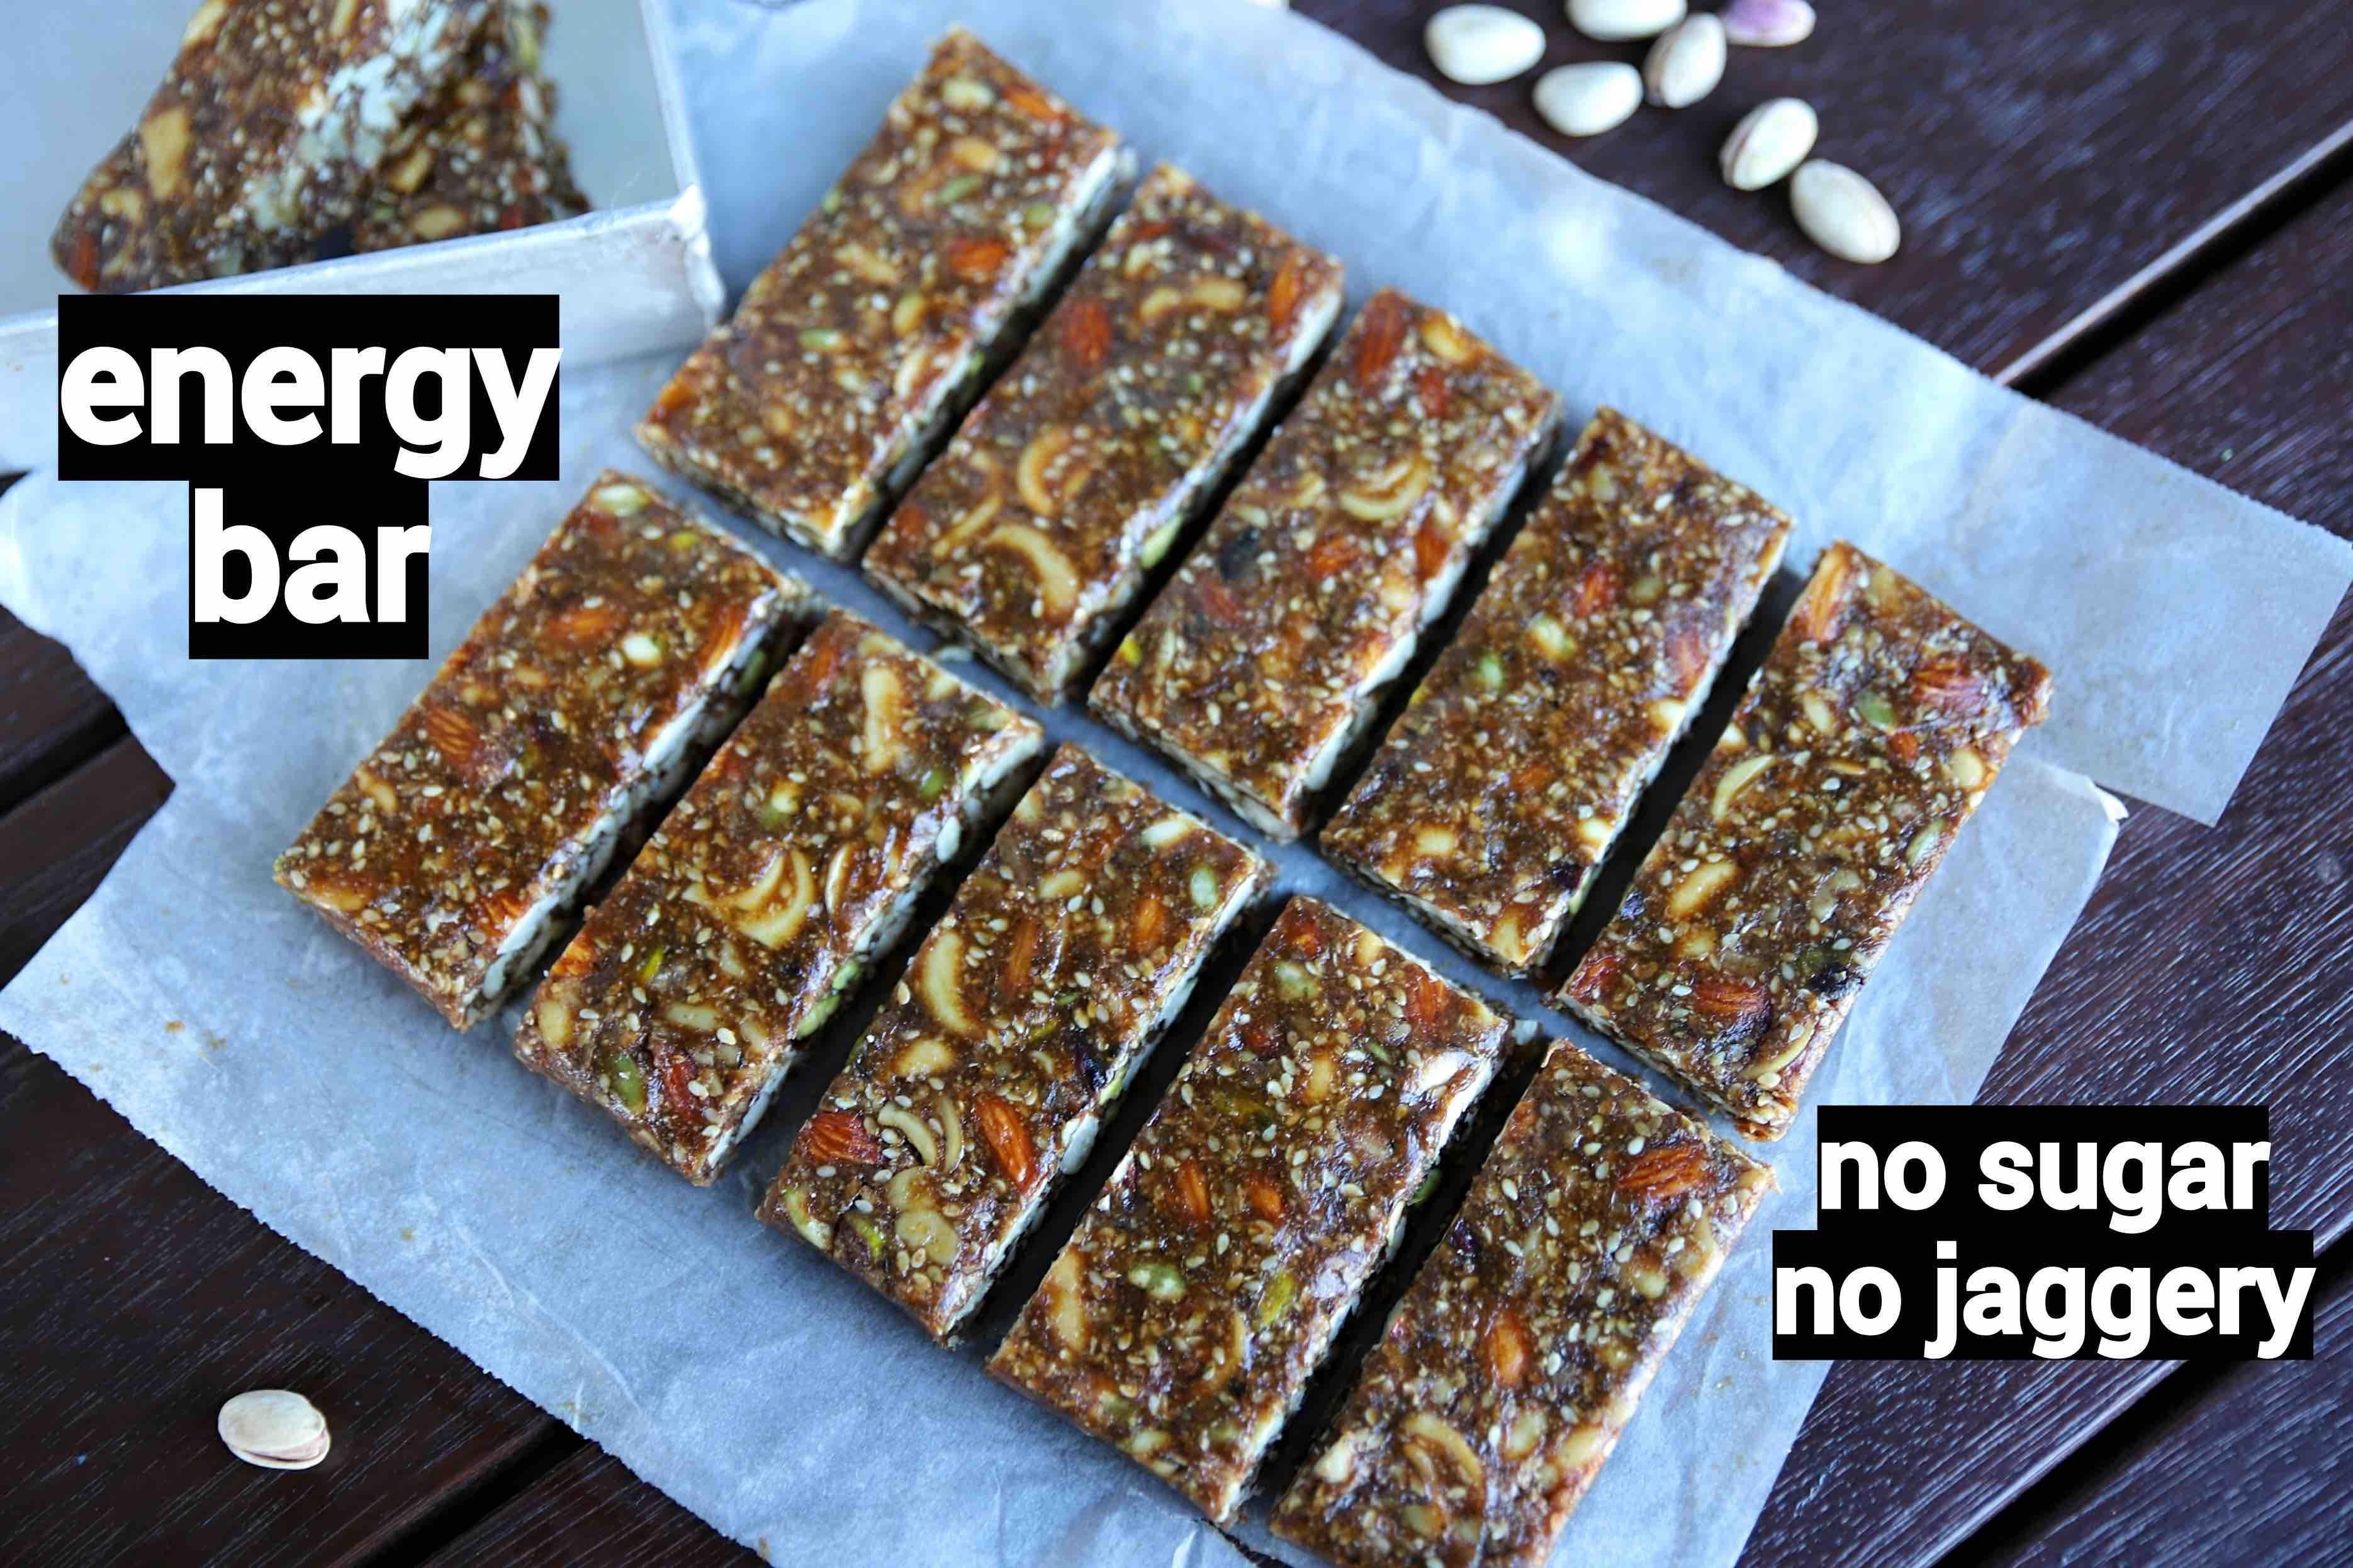 Energy Bar Recipe Protein Bar Recipe Dry Fruit Energy Bars Nut Bar Recipe Energy Bars Recipe Protein Bar Recipes Protein Bars Homemade